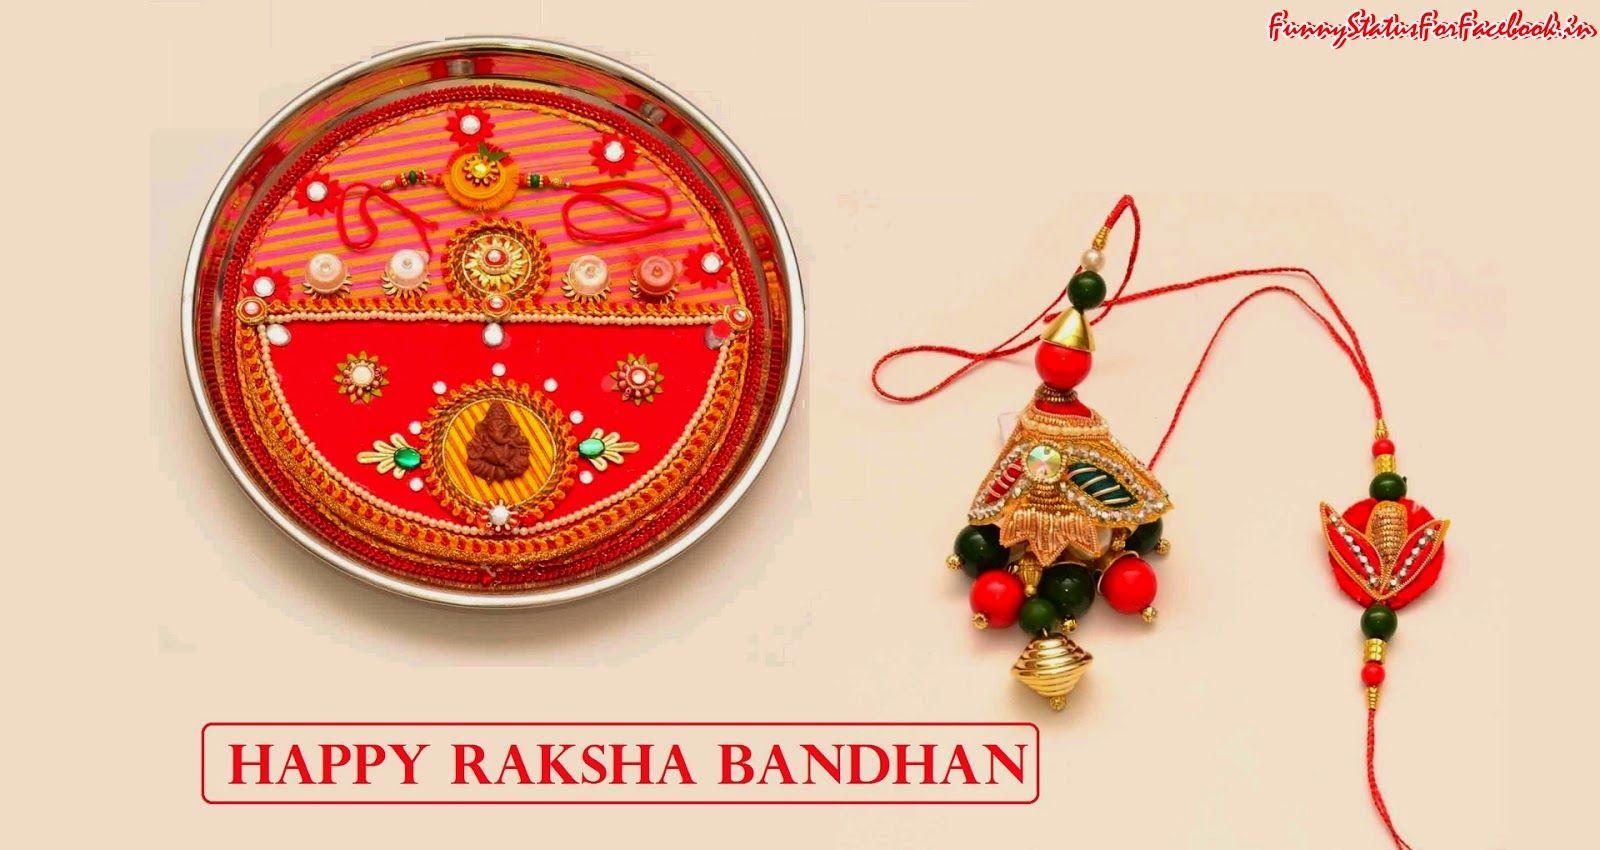 Happy raksha bandhan hd wallpapers images by happy raksha bandhan hd wallpapers images by funnystatusforfacebook kristyandbryce Choice Image